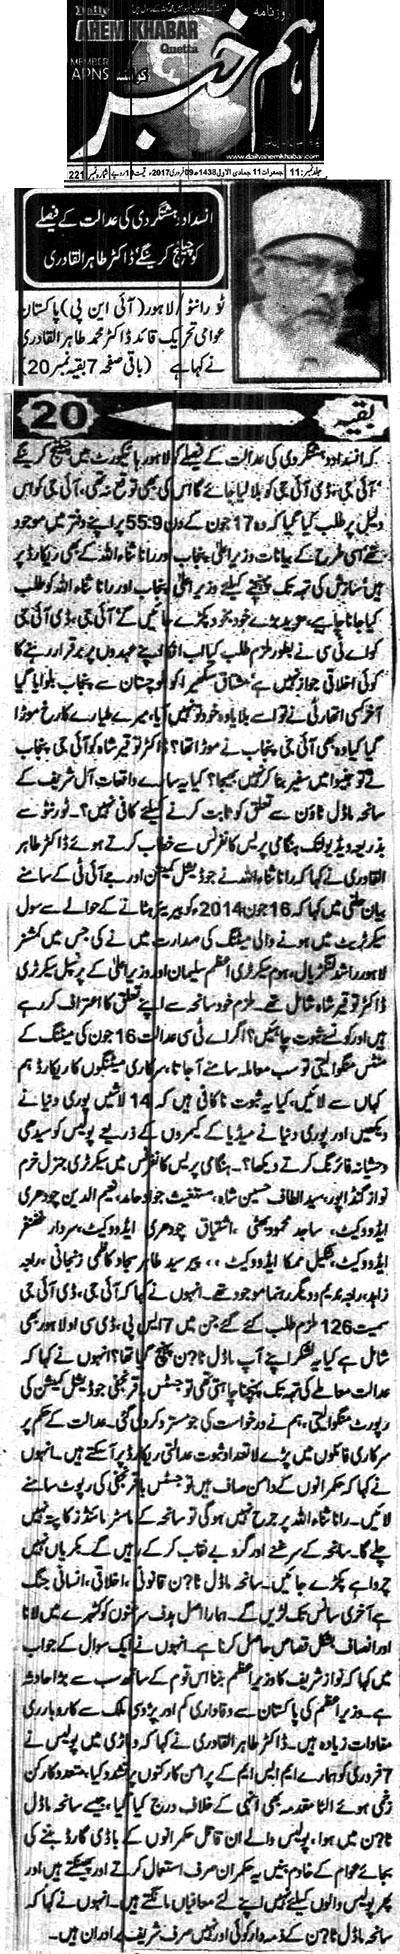 Pakistan Awami Tehreek  Print Media Coverage Daily Aham Khabar